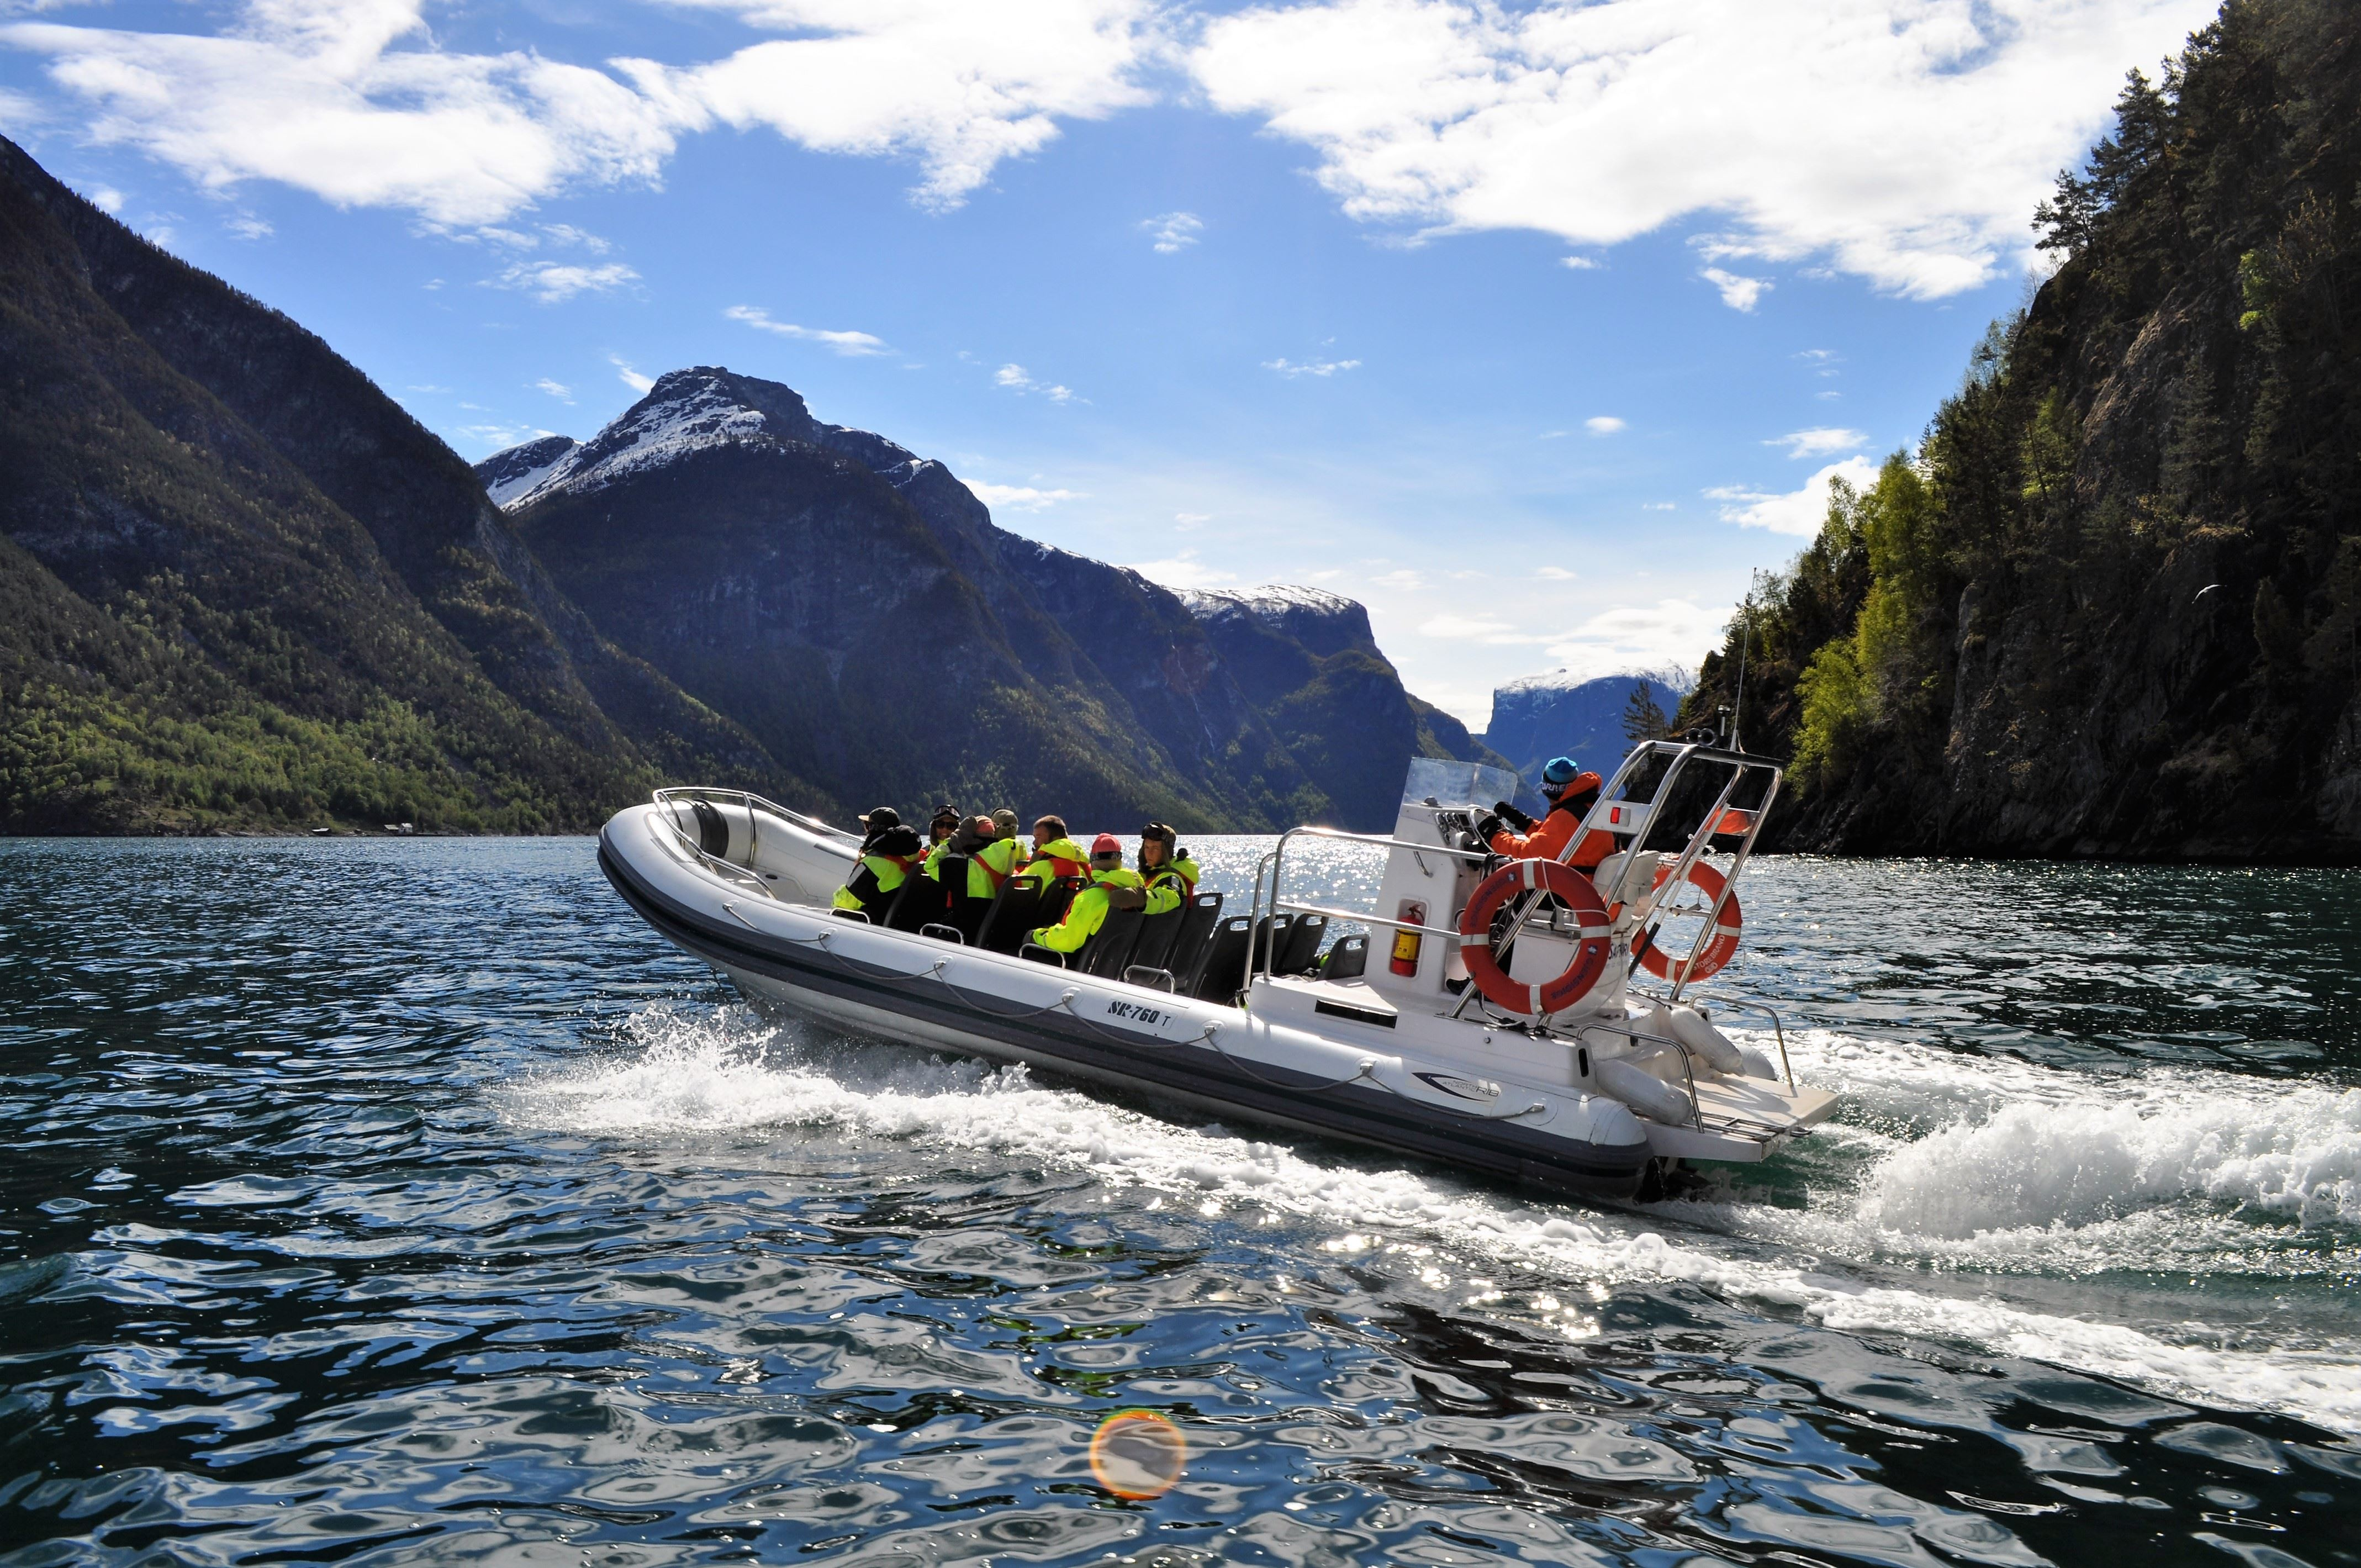 © Kristin Daviknes, Heritage FjordSafari